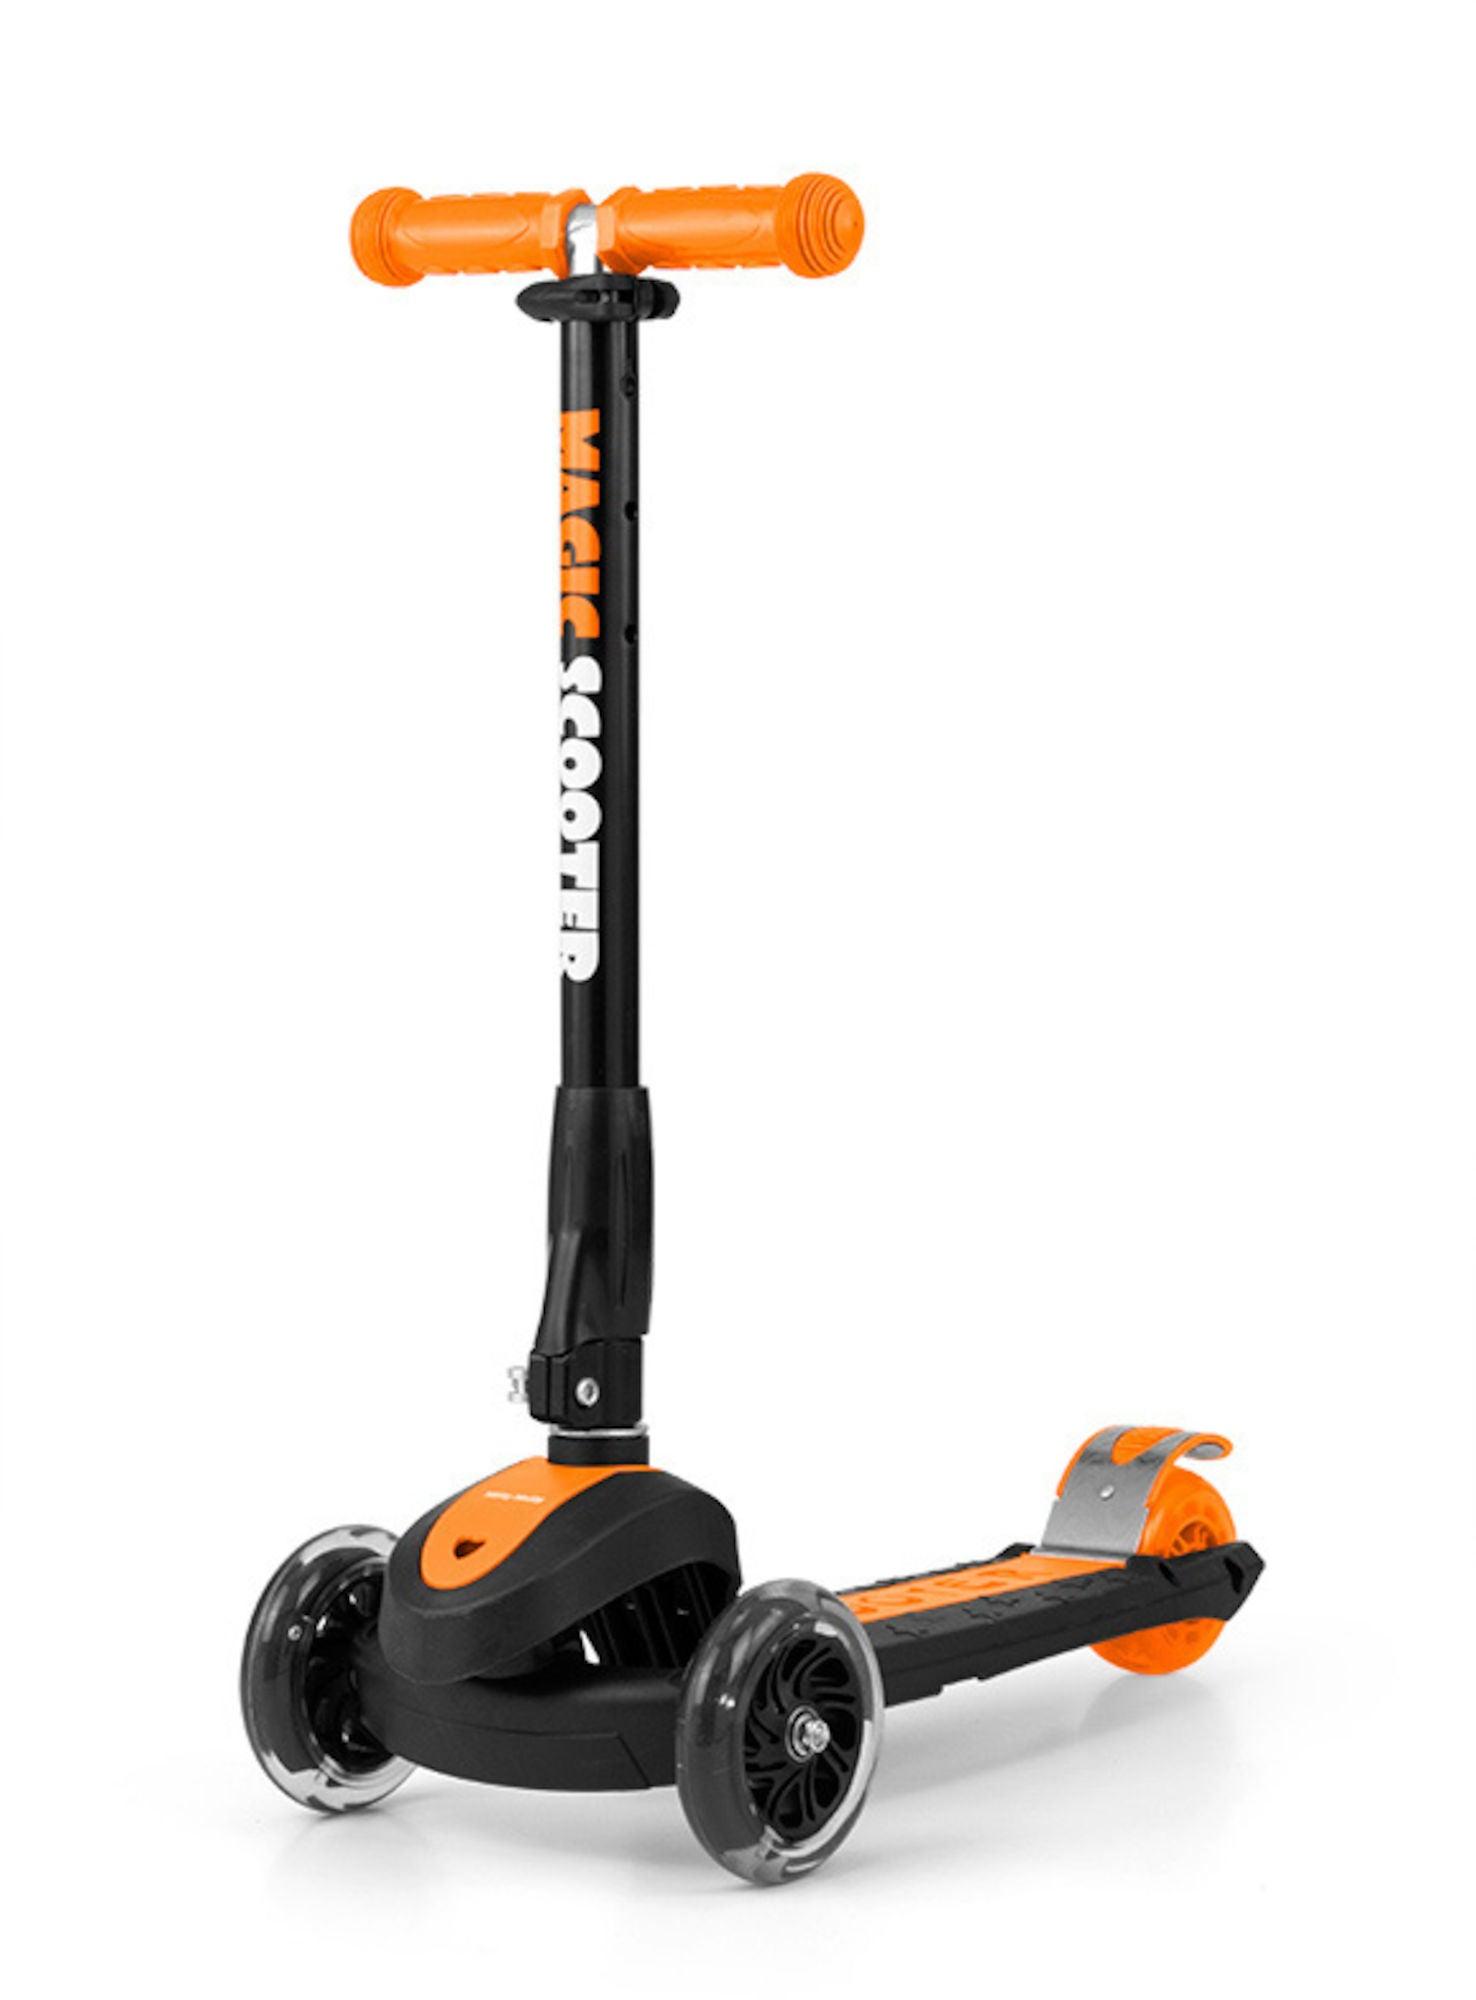 Milly Mally Magic Scooter Sparkcykel, Orange